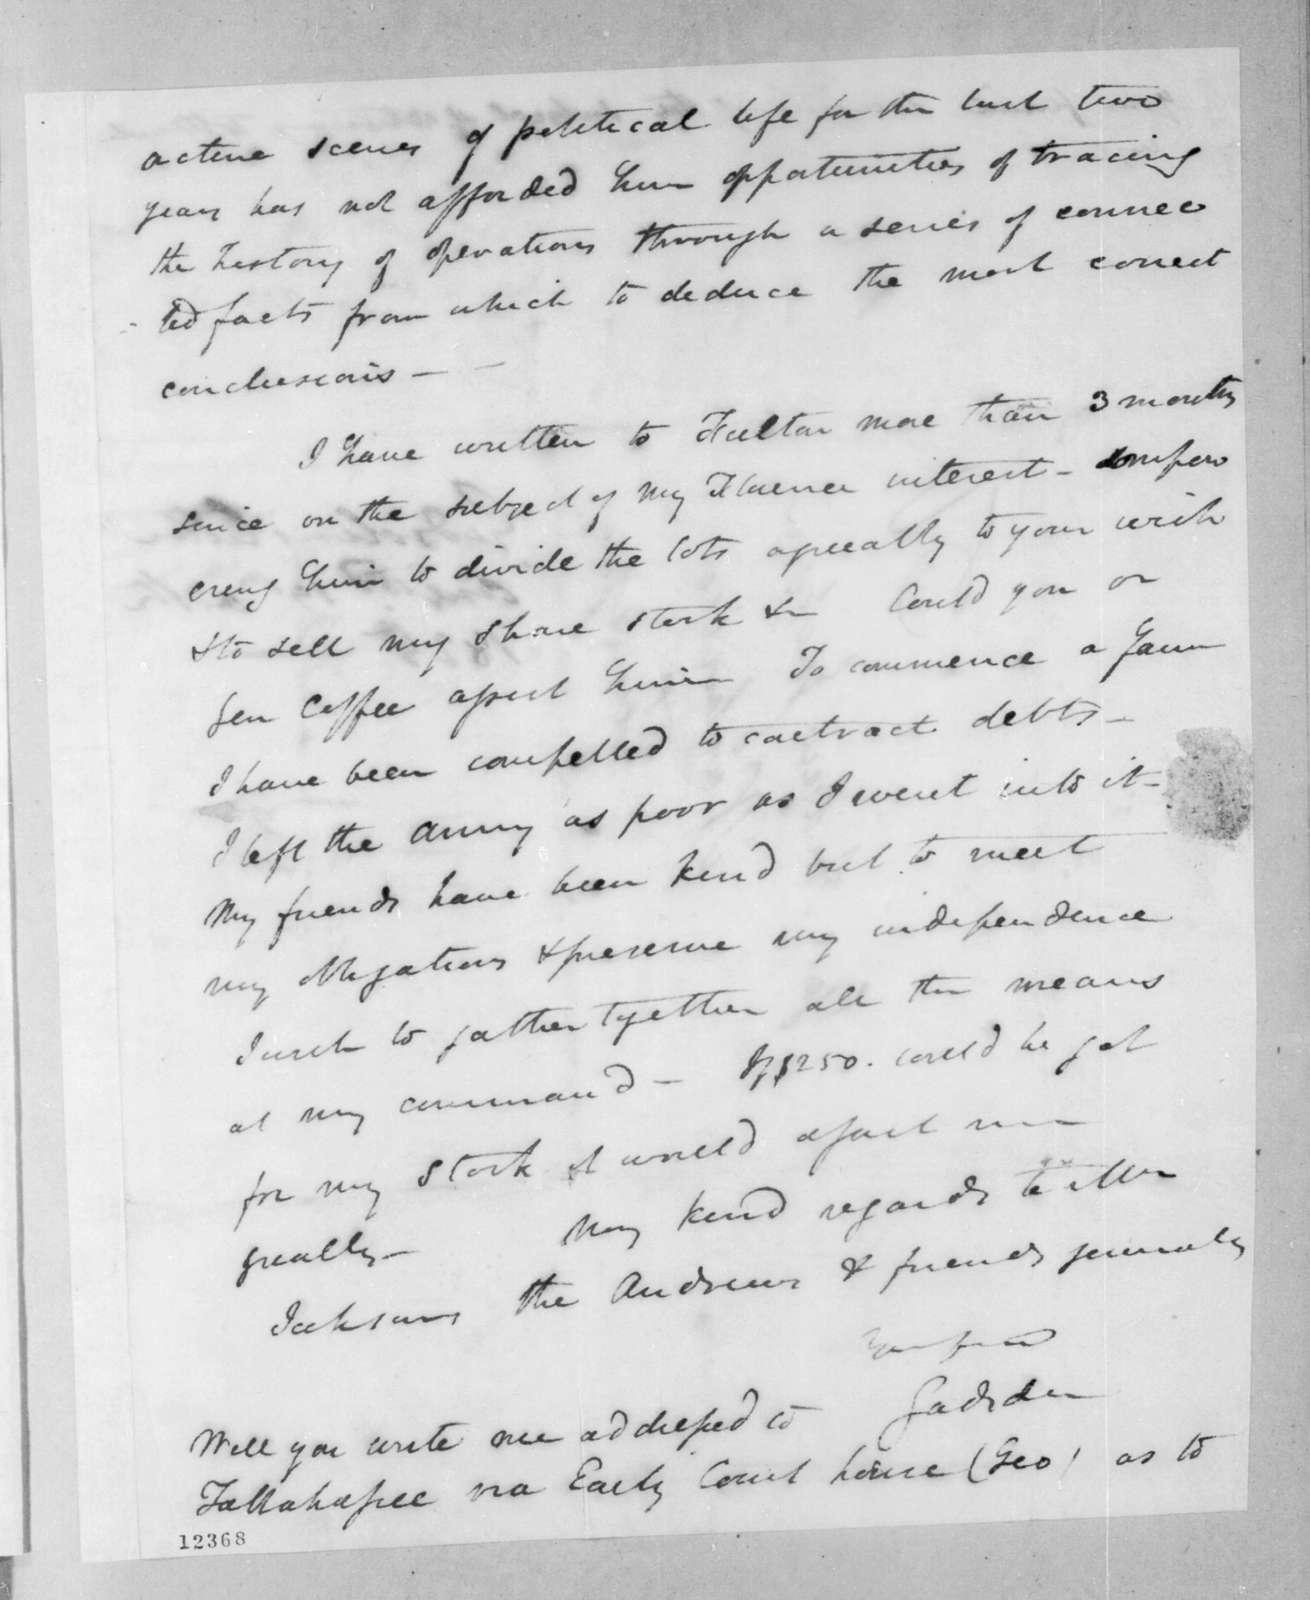 James Gadsden to Andrew Jackson, September 15, 1825